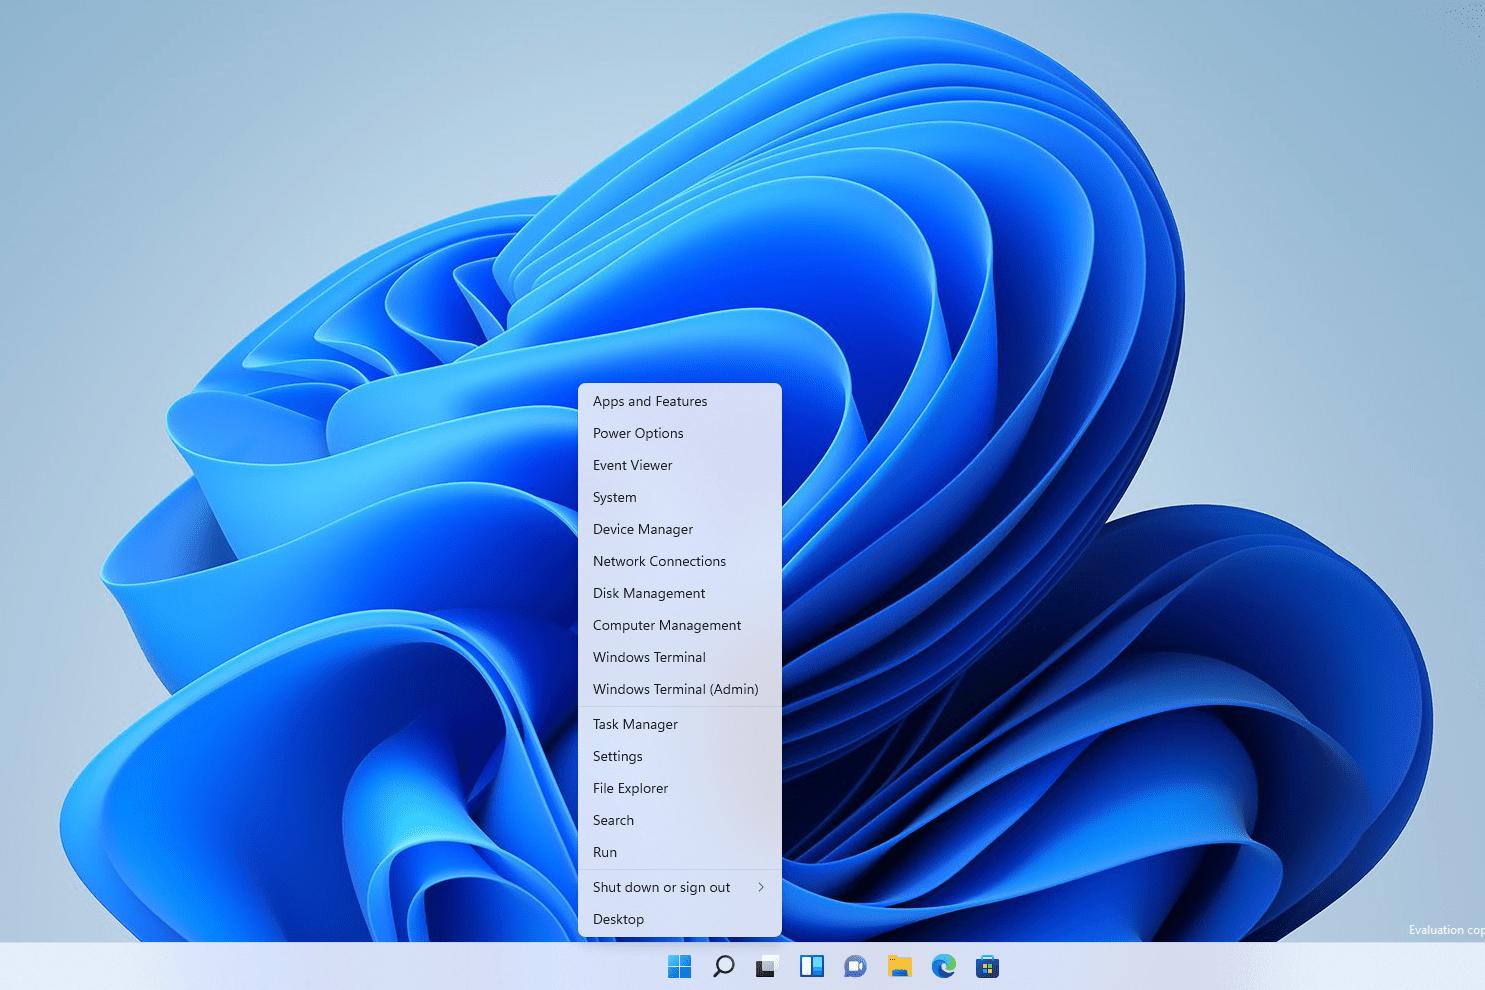 Windows 11 power user menu